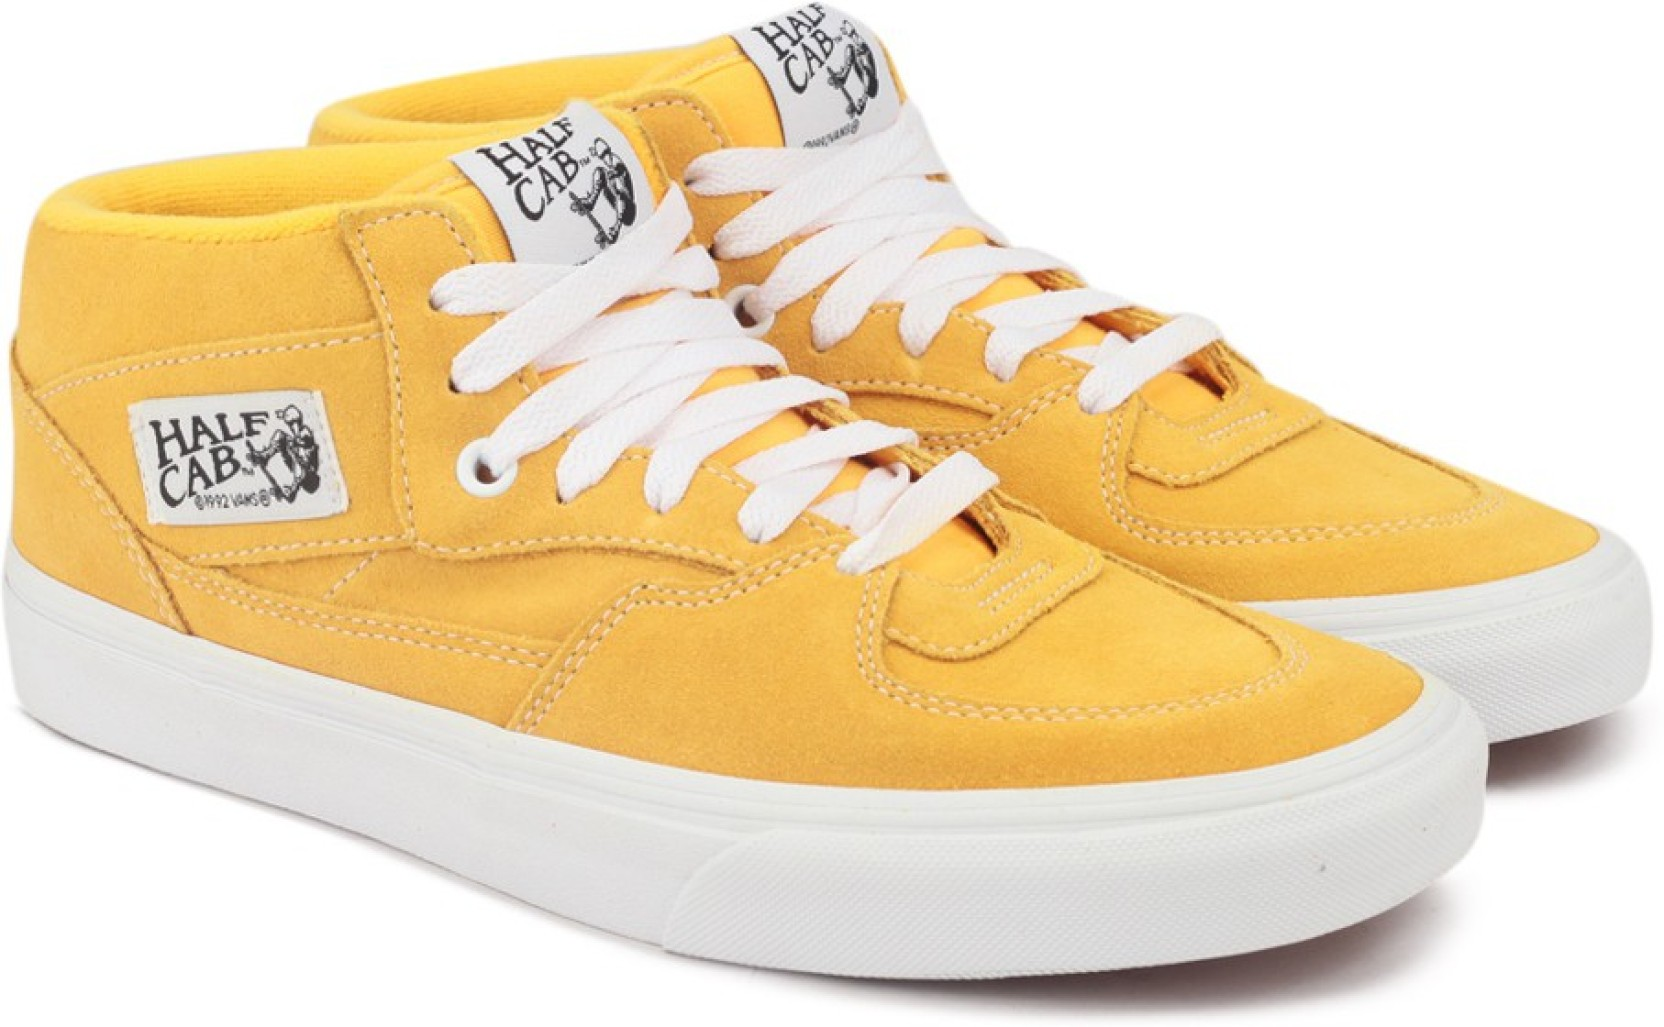 0da177bc72a5 Vans half cab mid ankle sneakers for men buy suede citrus true jpg  1664x1027 Yellow vans